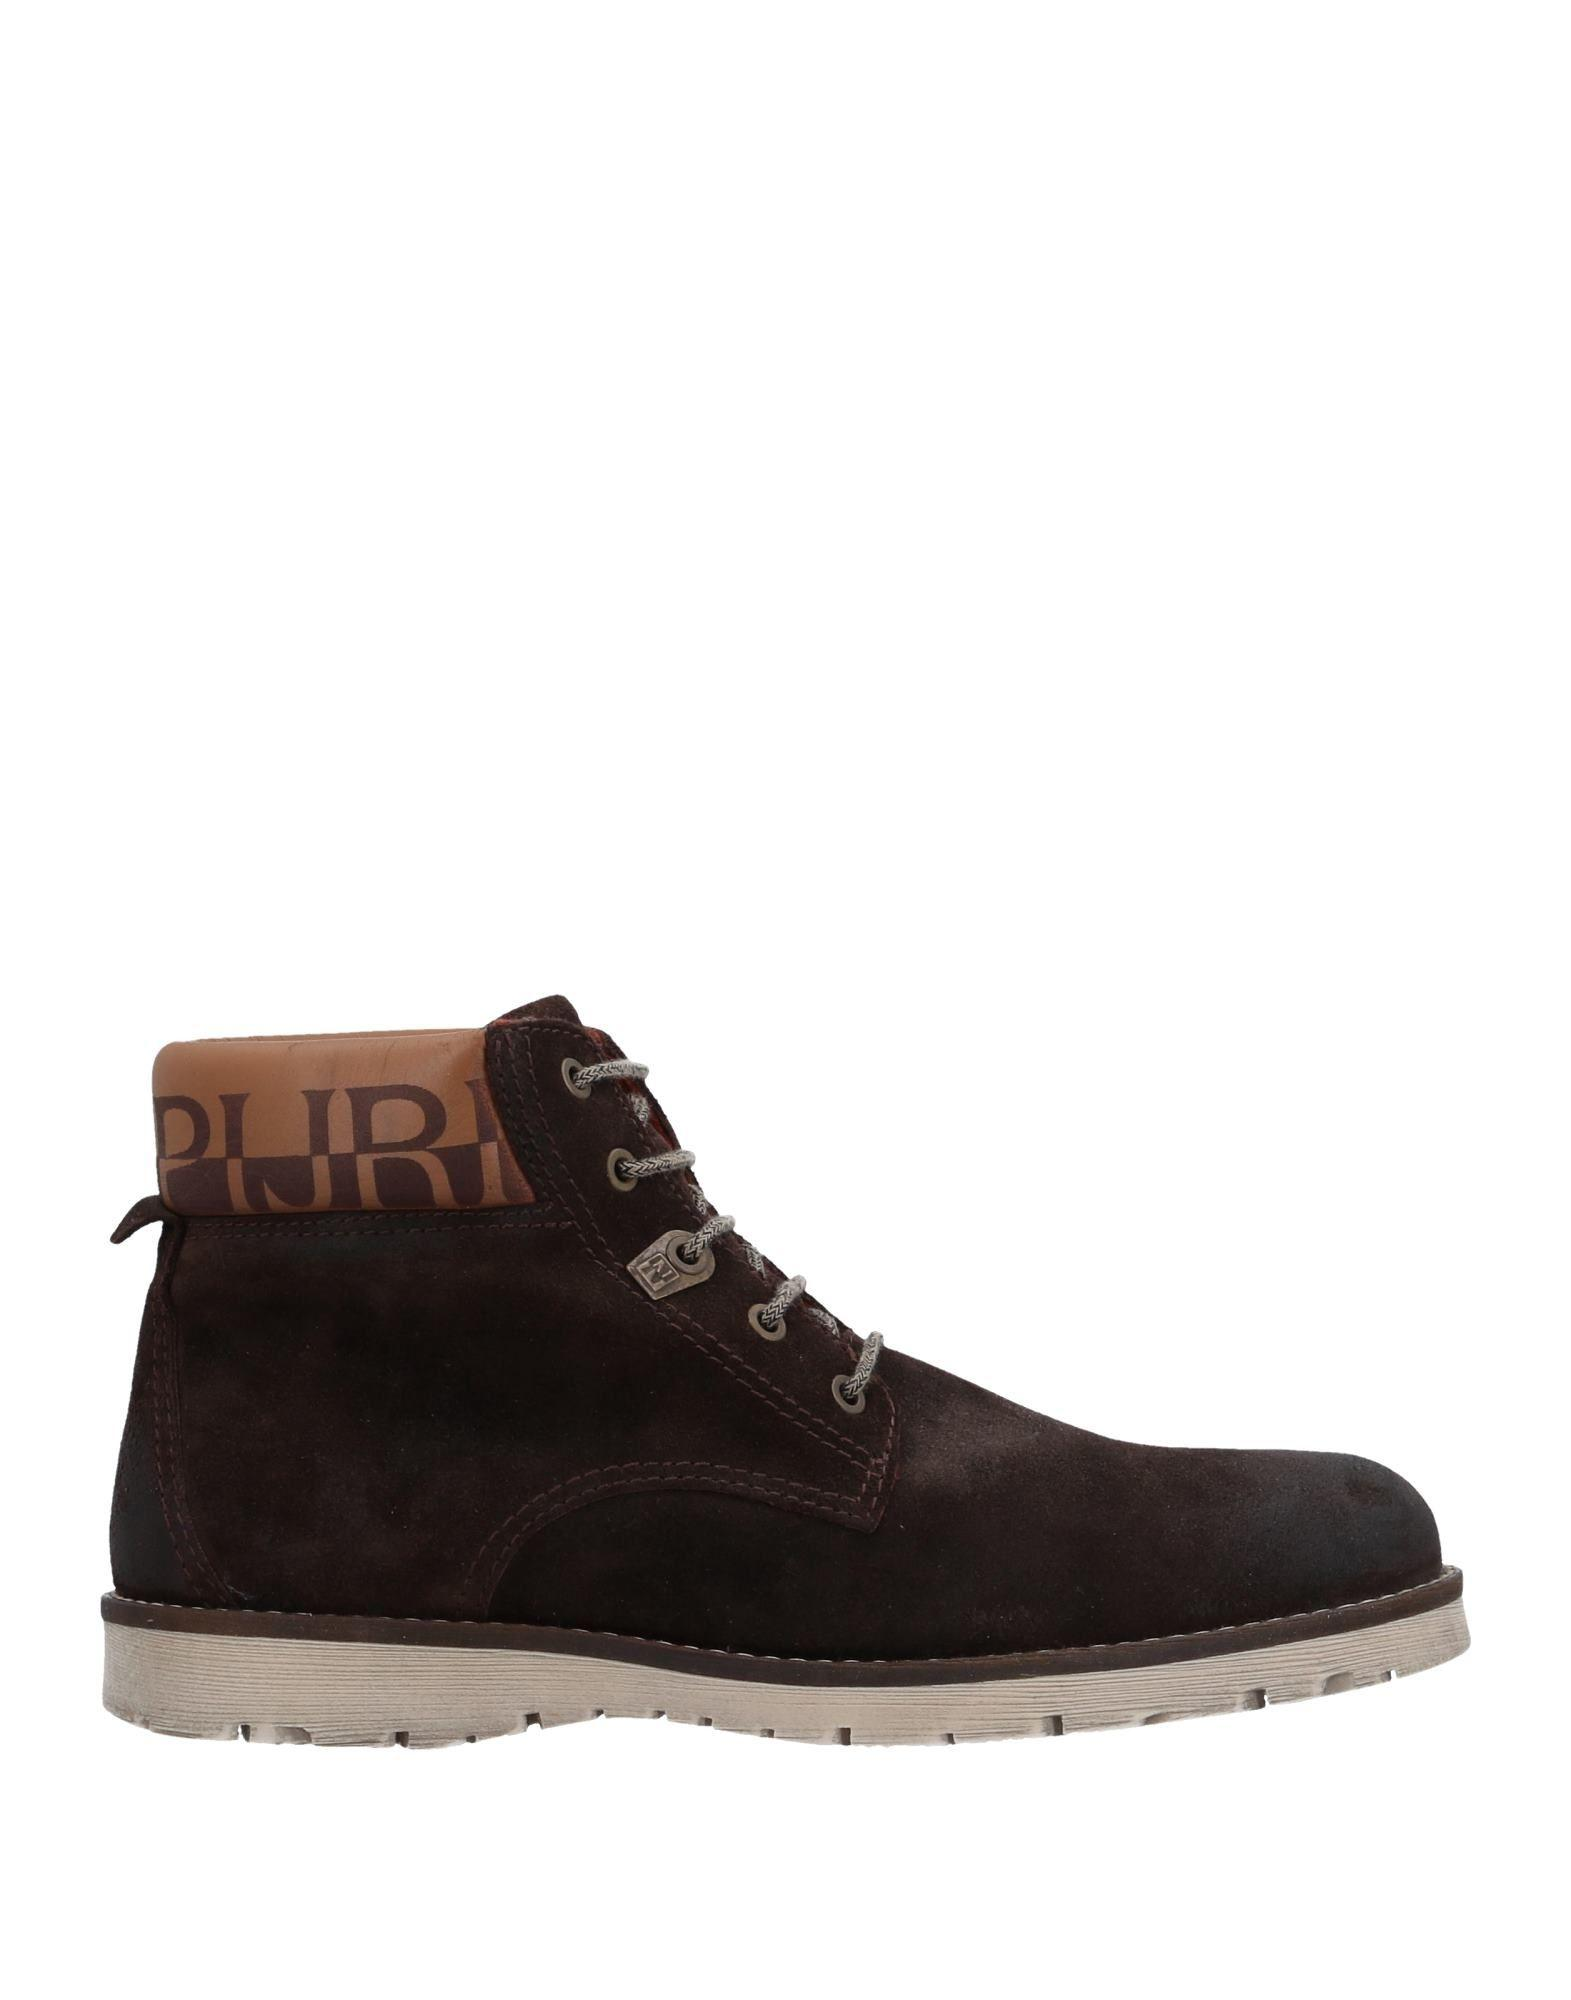 FOOTWEAR - Ankle boots on YOOX.COM Napapijri LeM9FN1cy